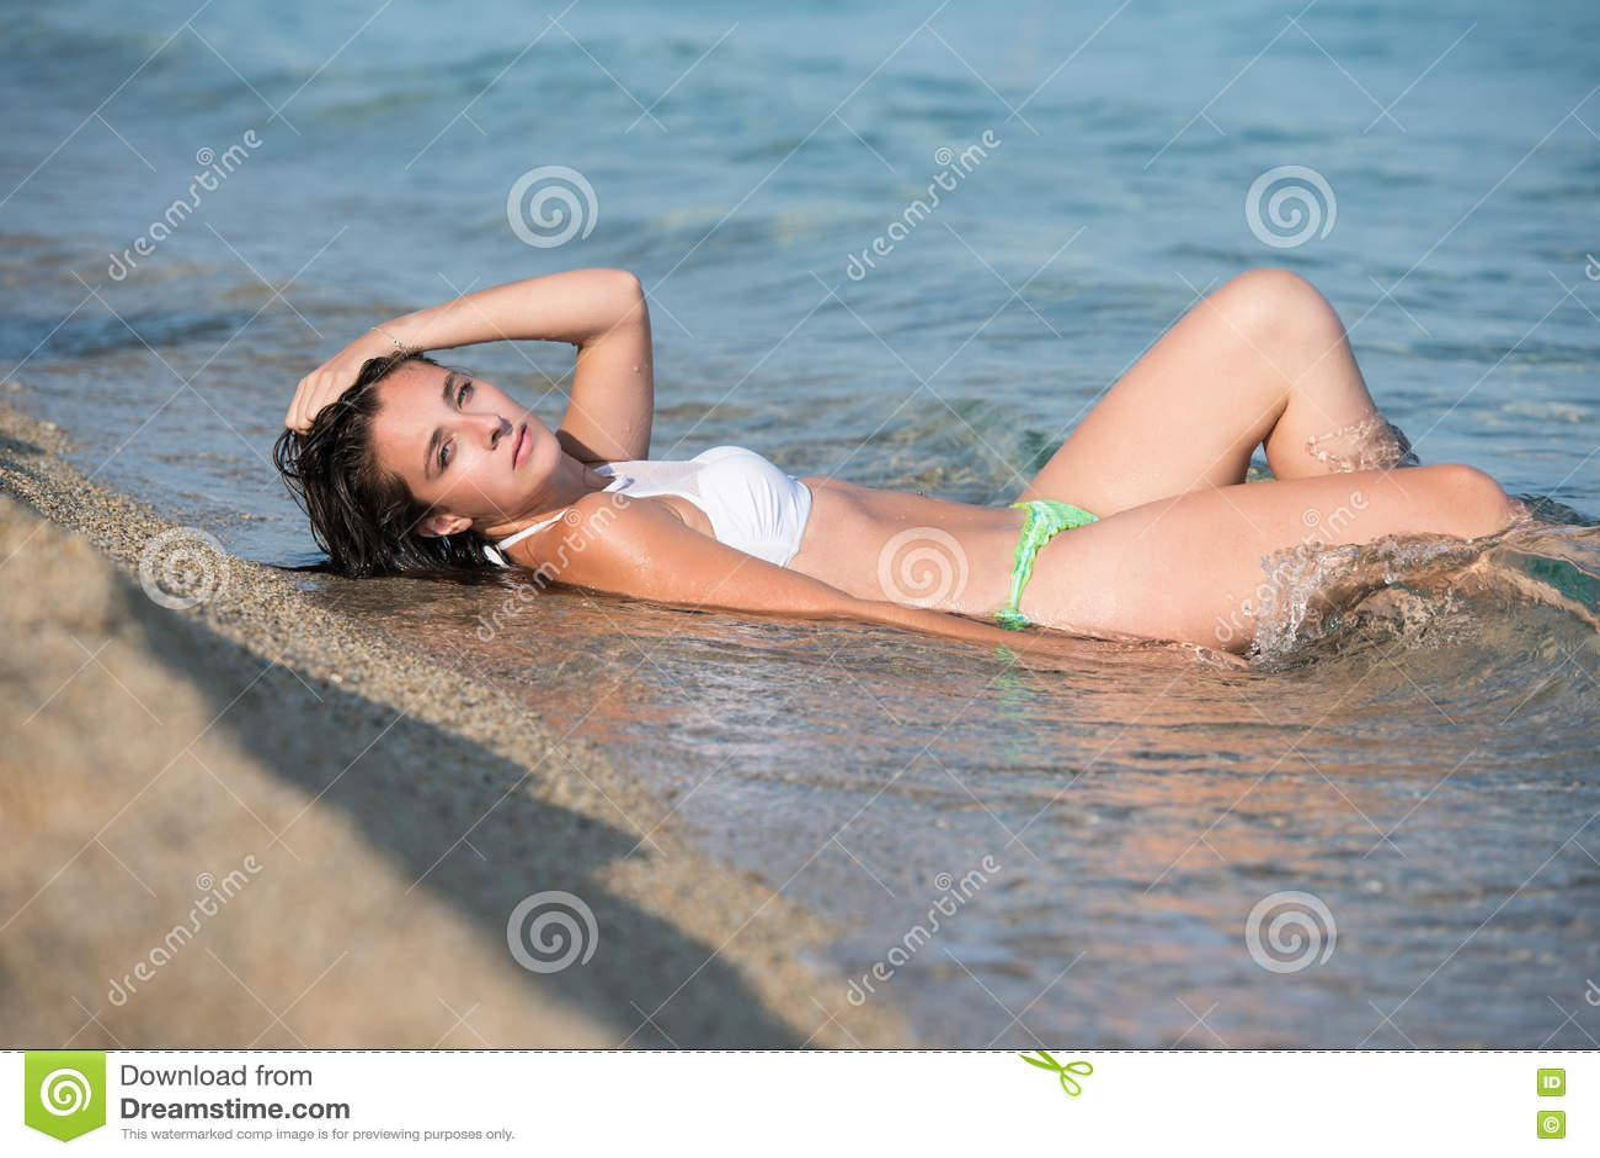 Jennifer aniston in black pantyhose